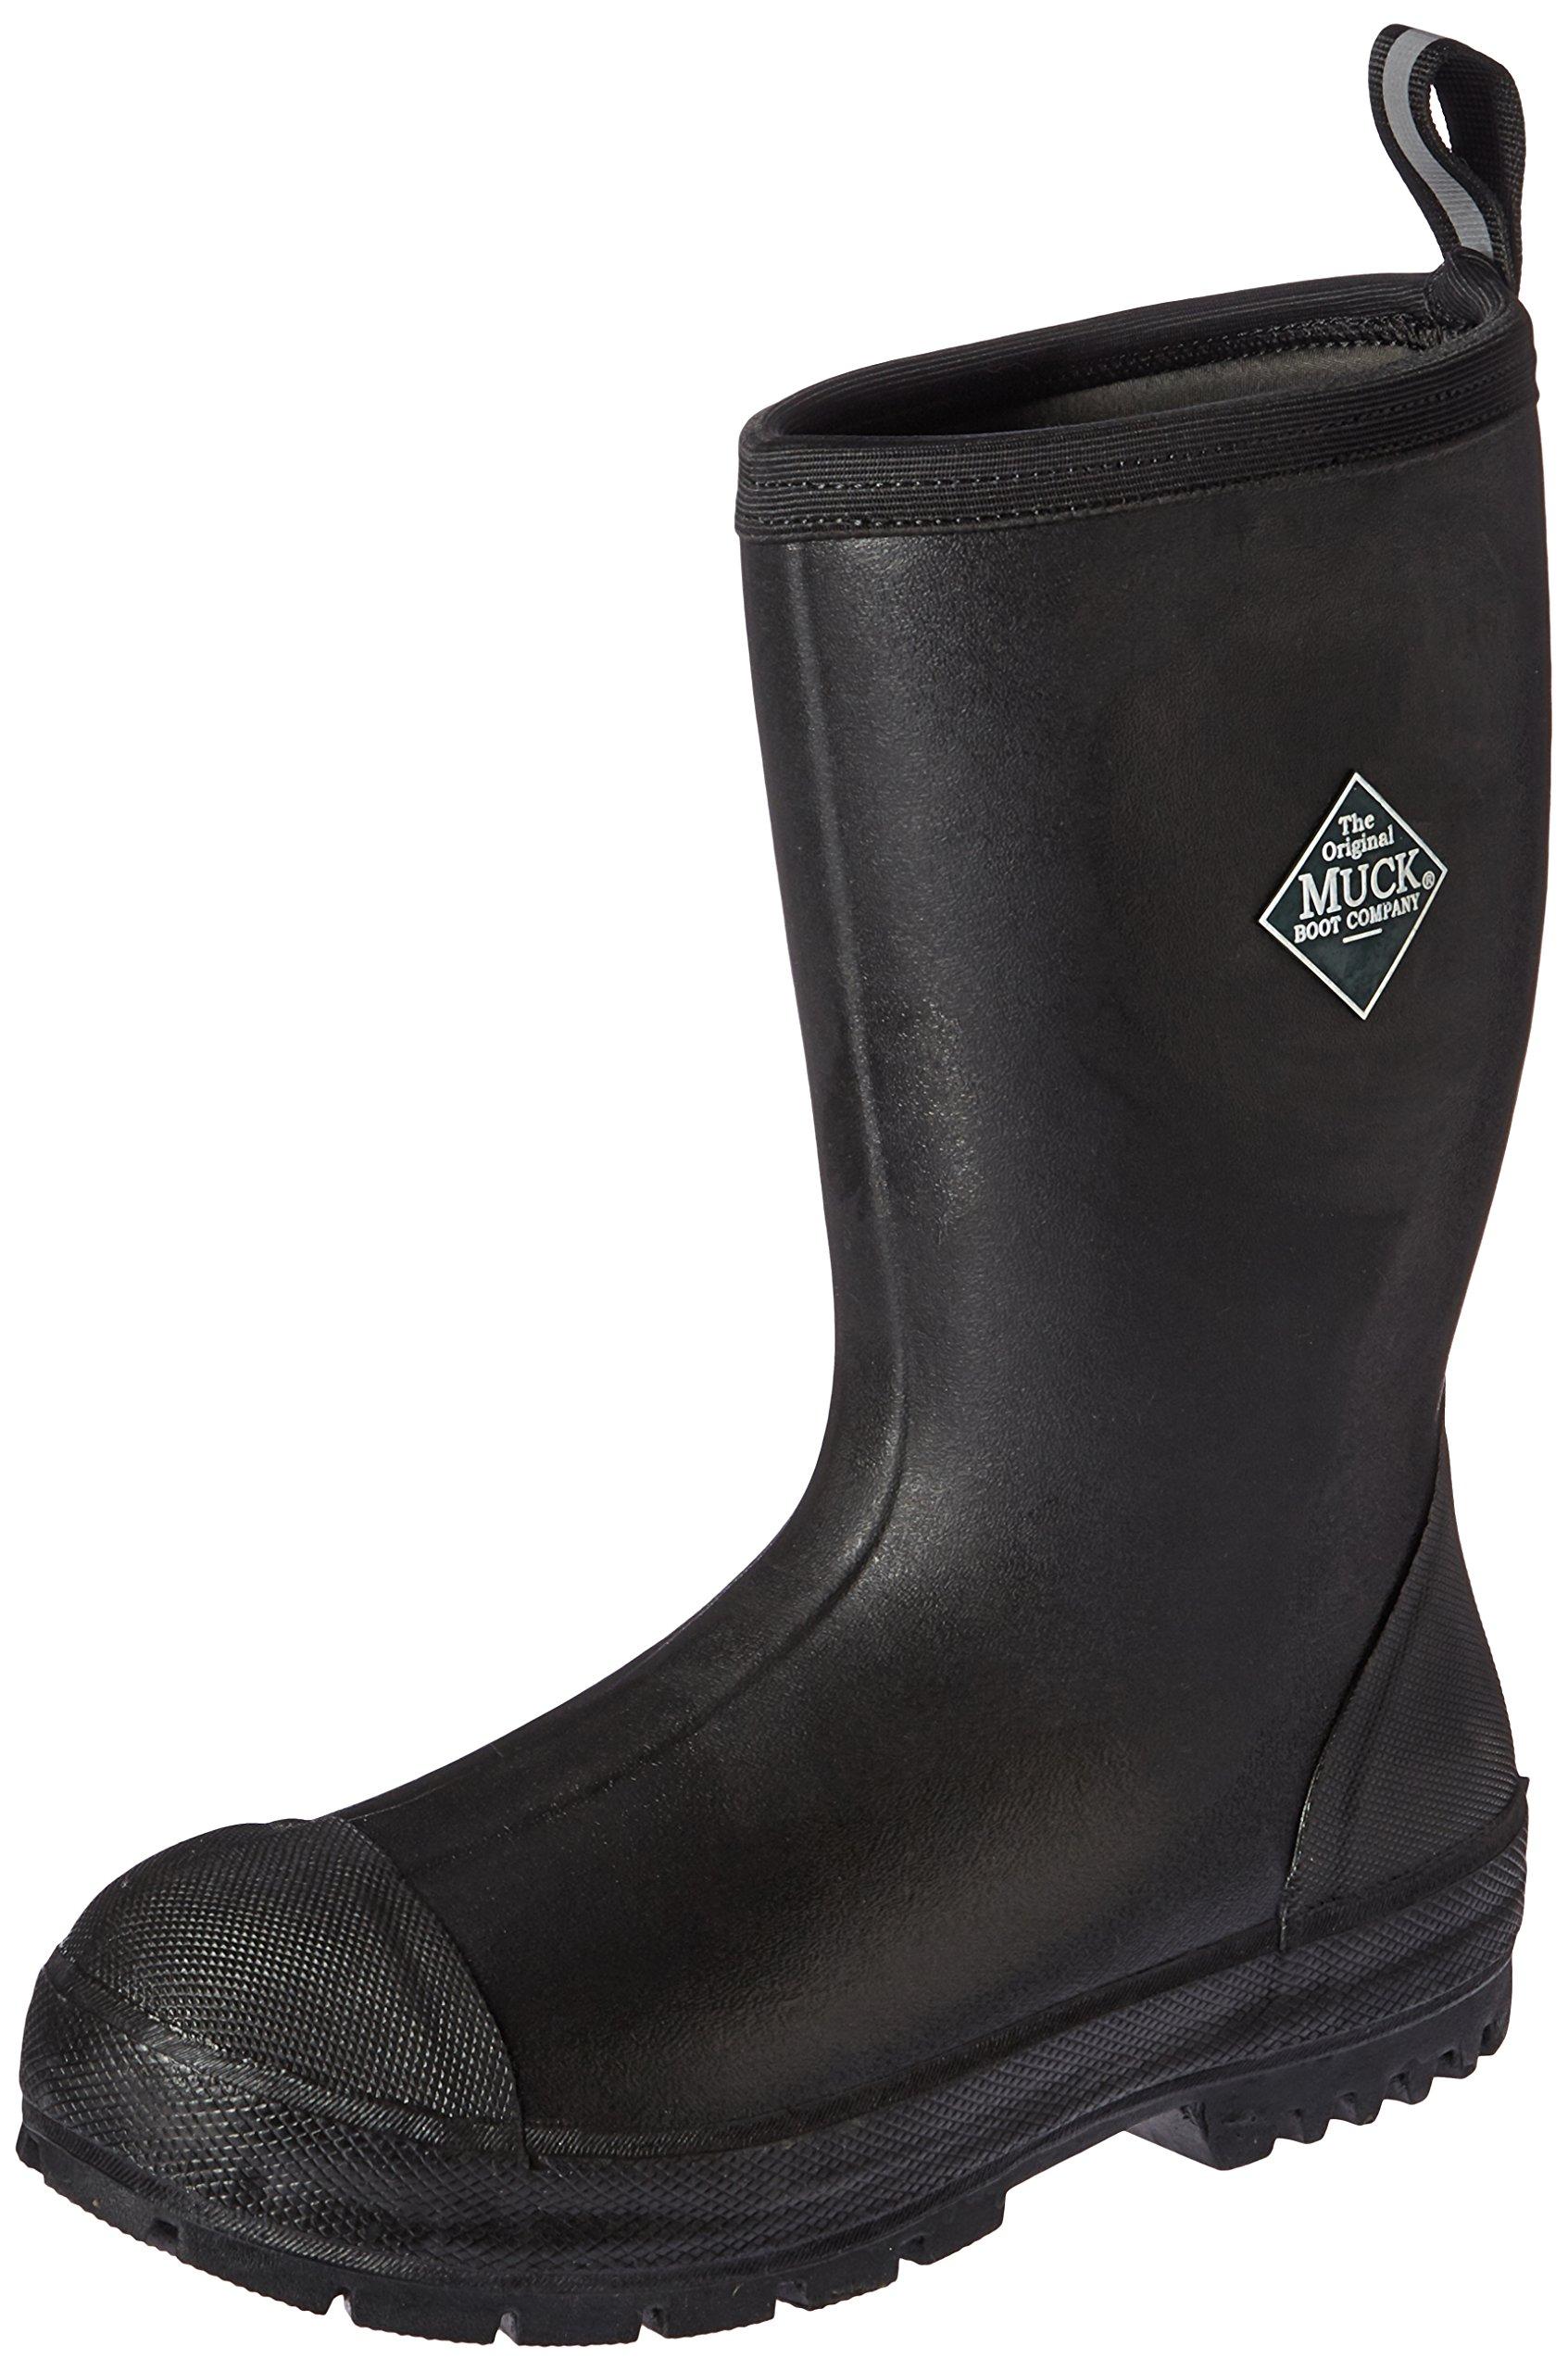 Muck Boot Men's Chore Resistant Mid Work Boot, Black, 13 M US